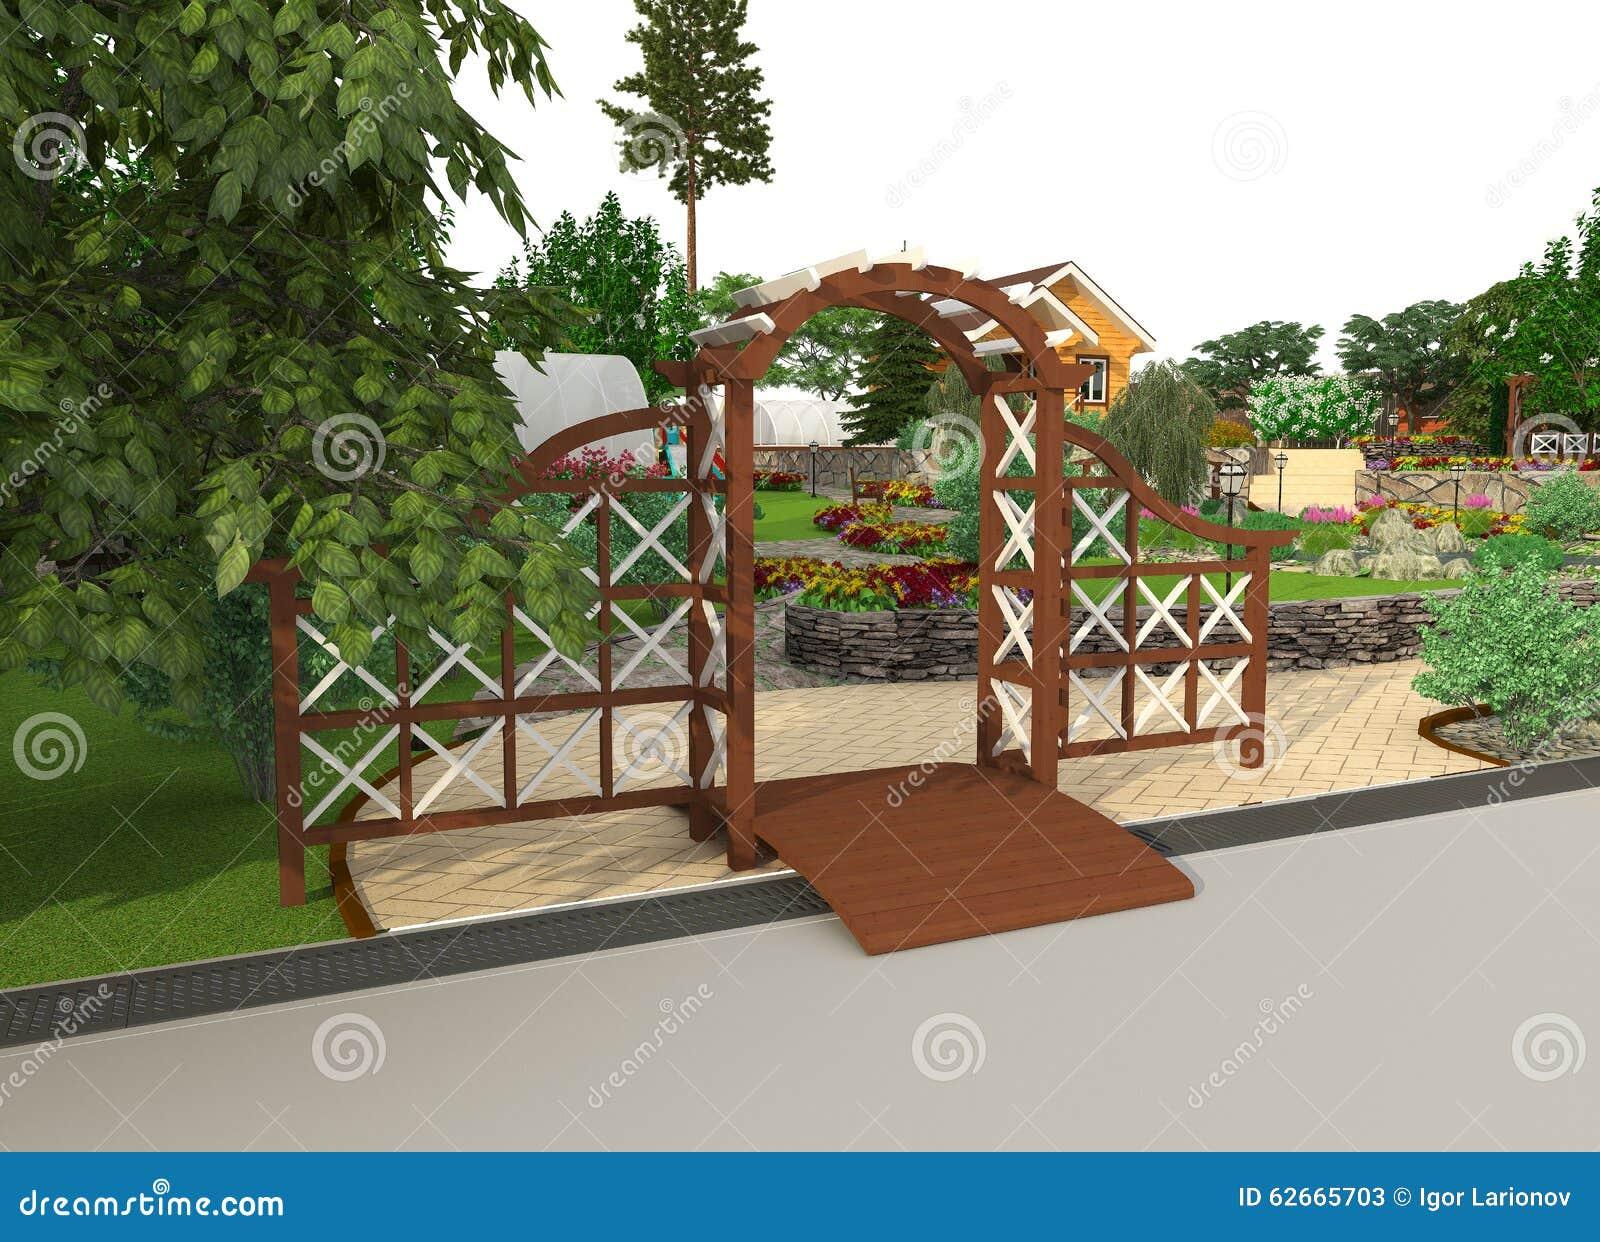 Design A Garden Plot Stock Illustration Image 62665703